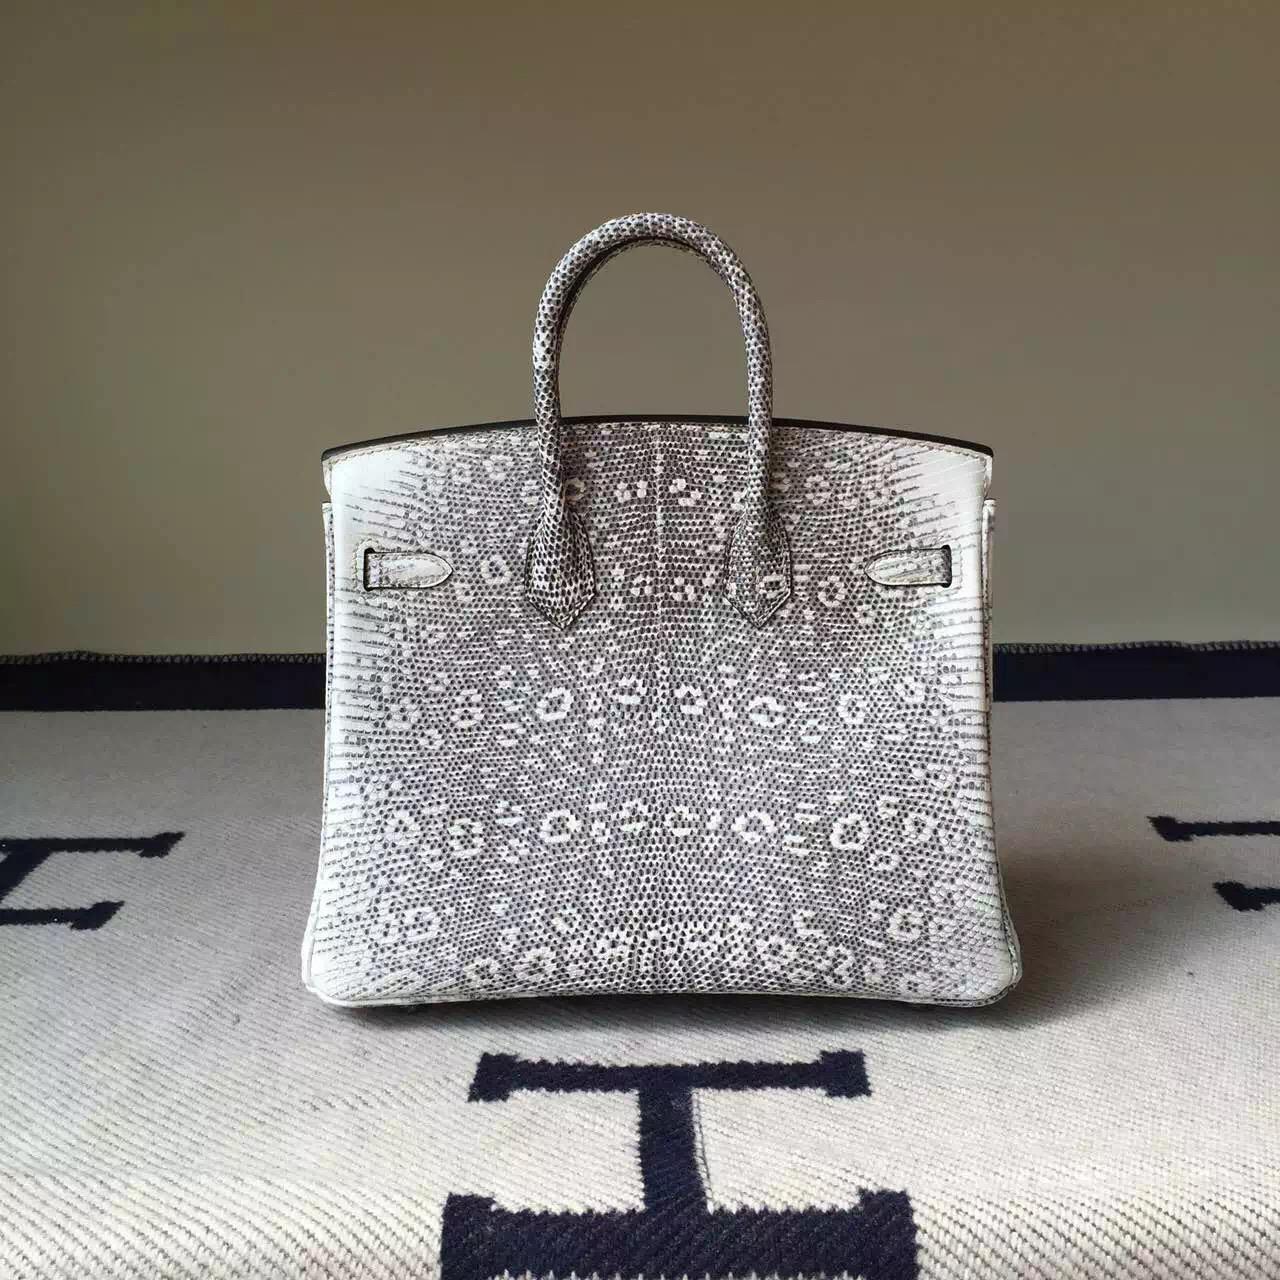 Hot Sale Hermes Nature Lizard Skin Leather Birkin Bag 25cm Silver Hardware